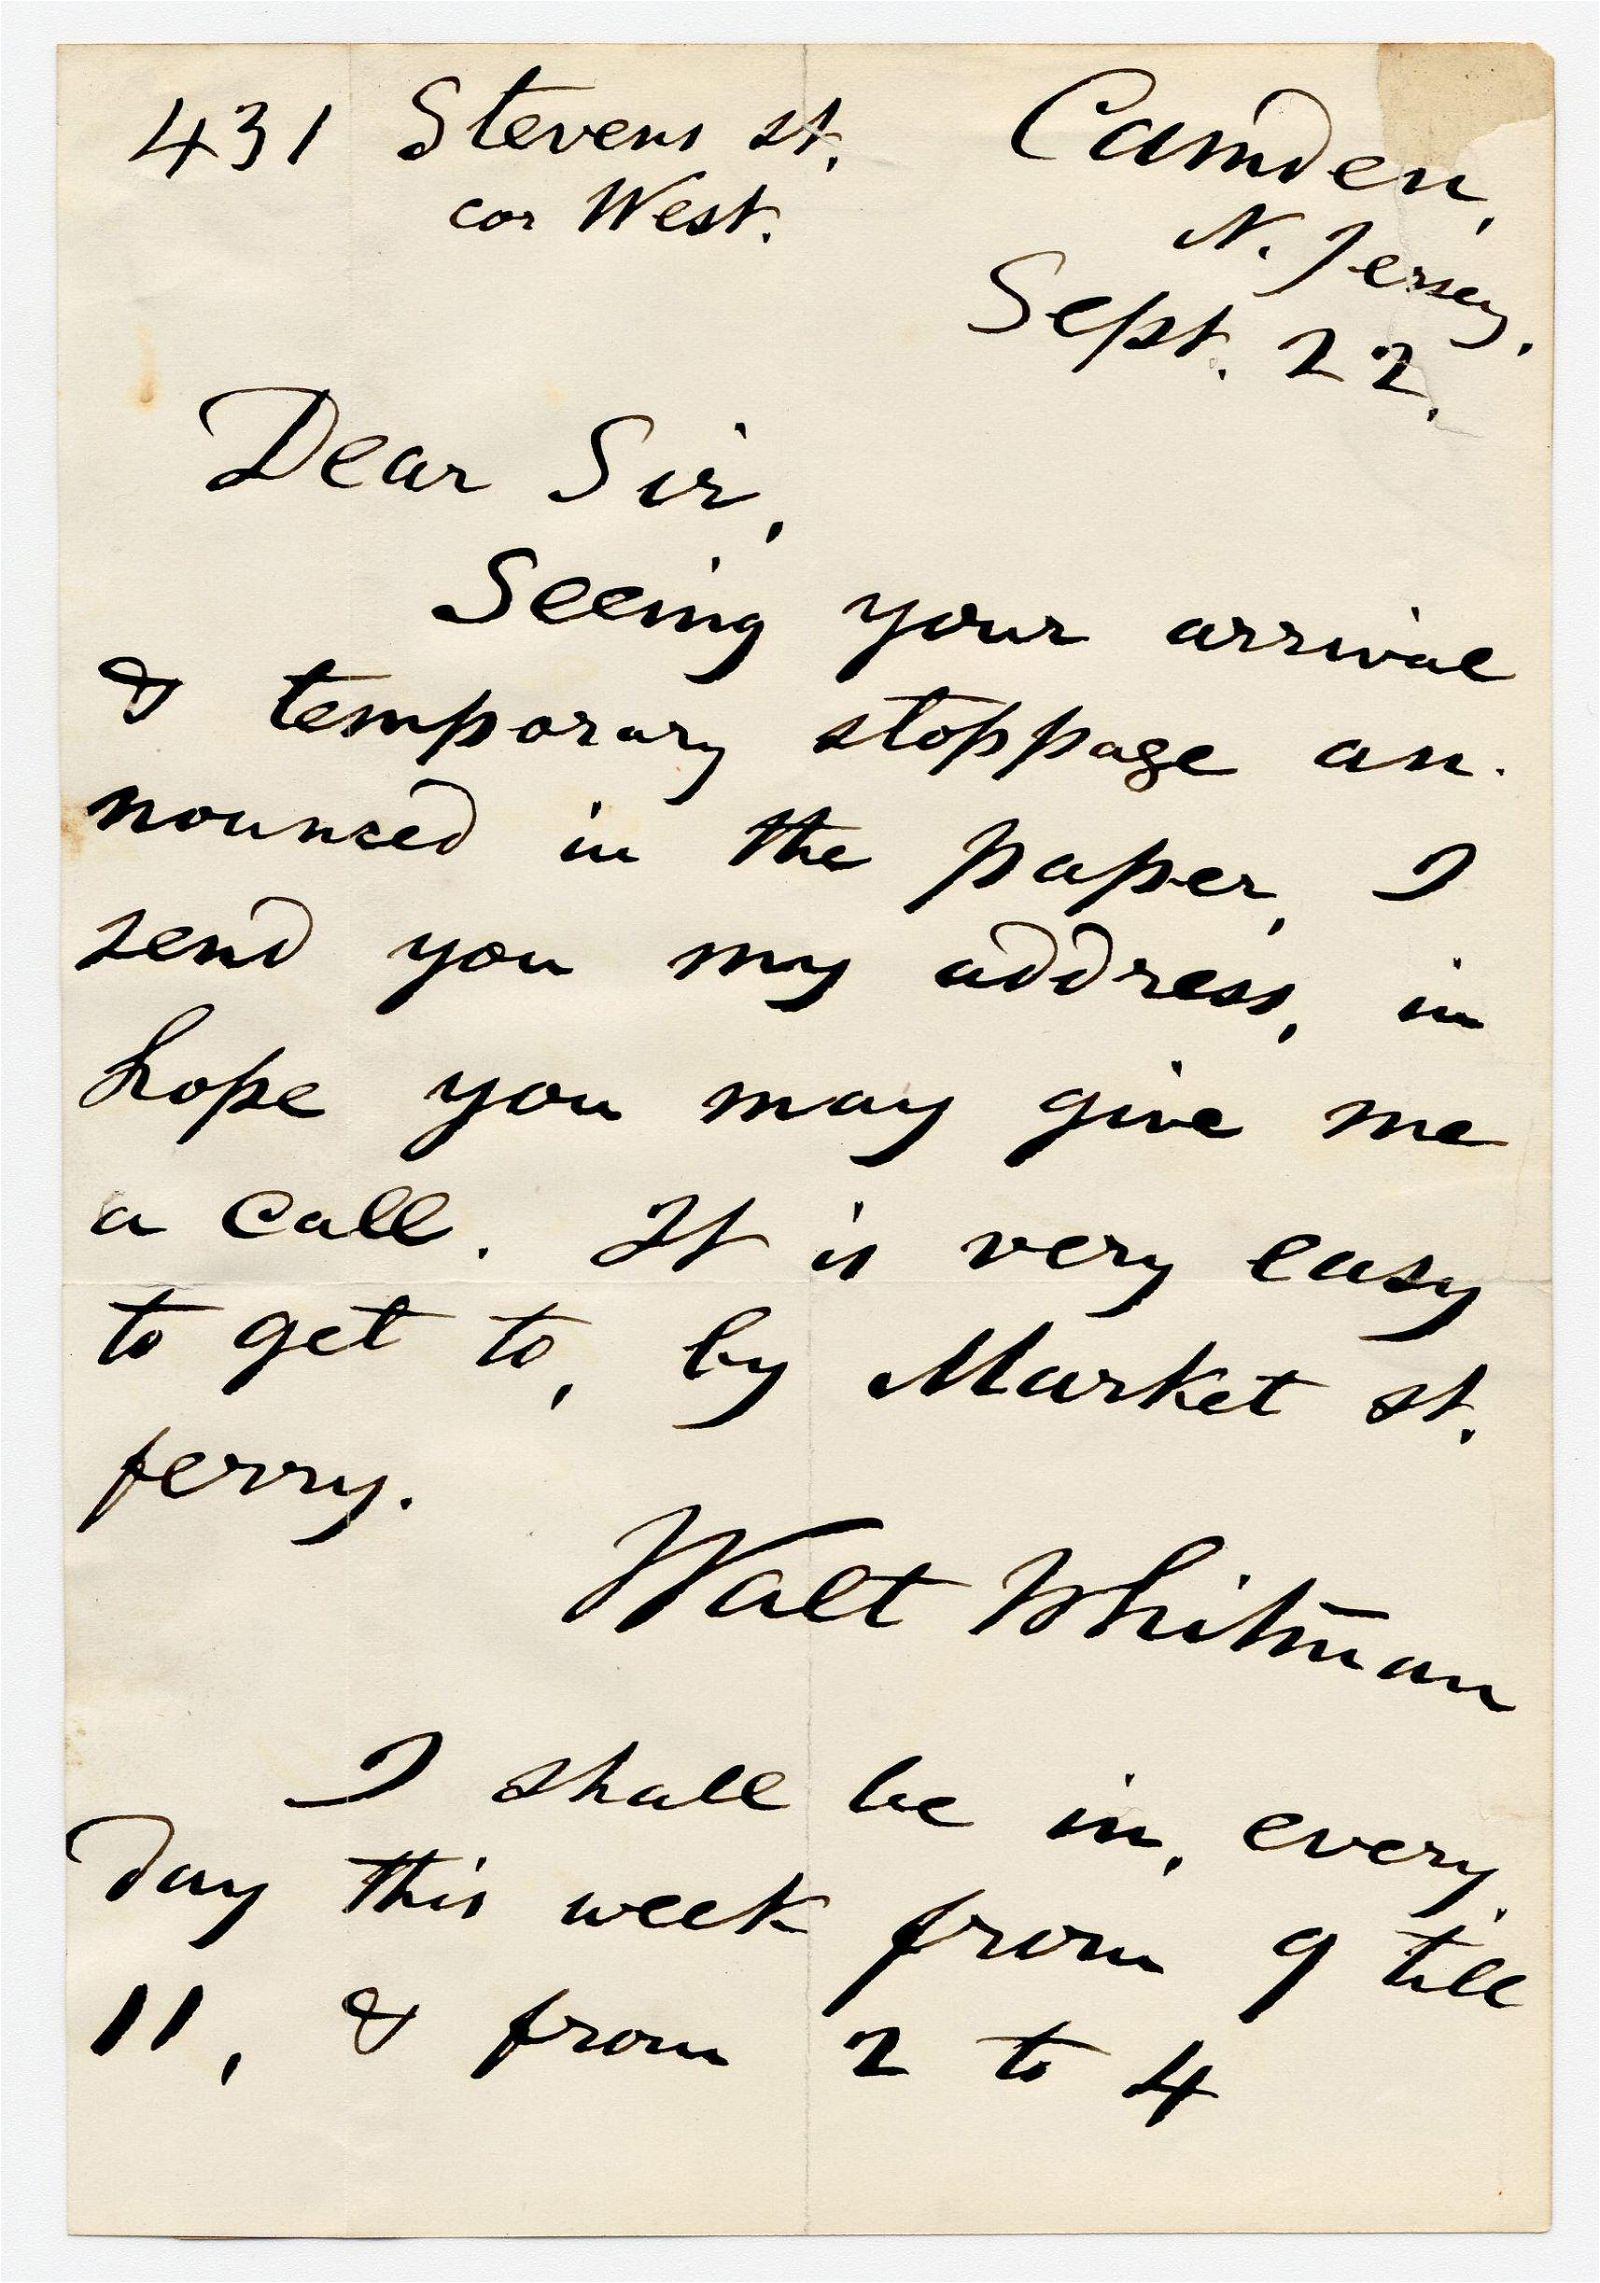 Walt Whitman ALS Inviting Philadelphia Visitor to